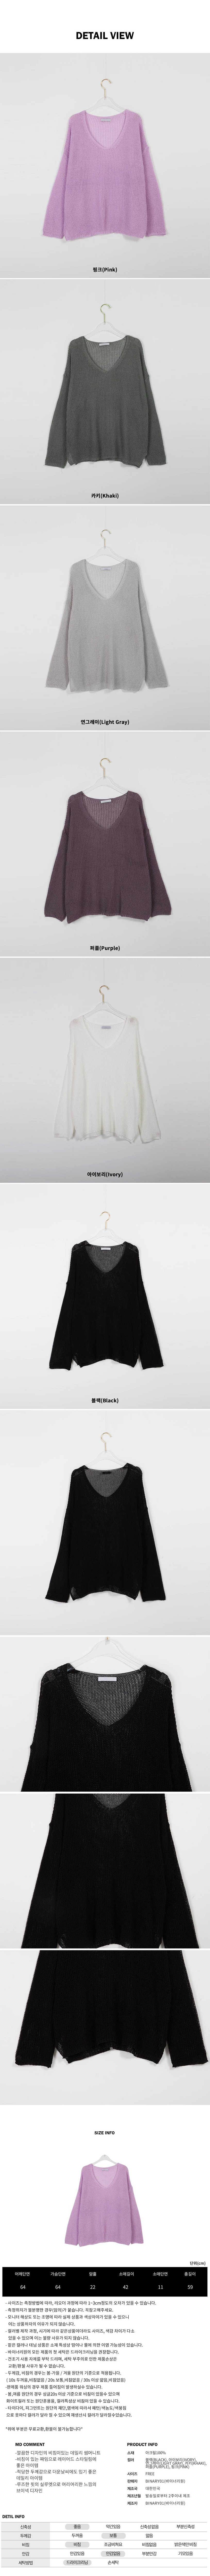 V-Neck Belling Summer Knitwear